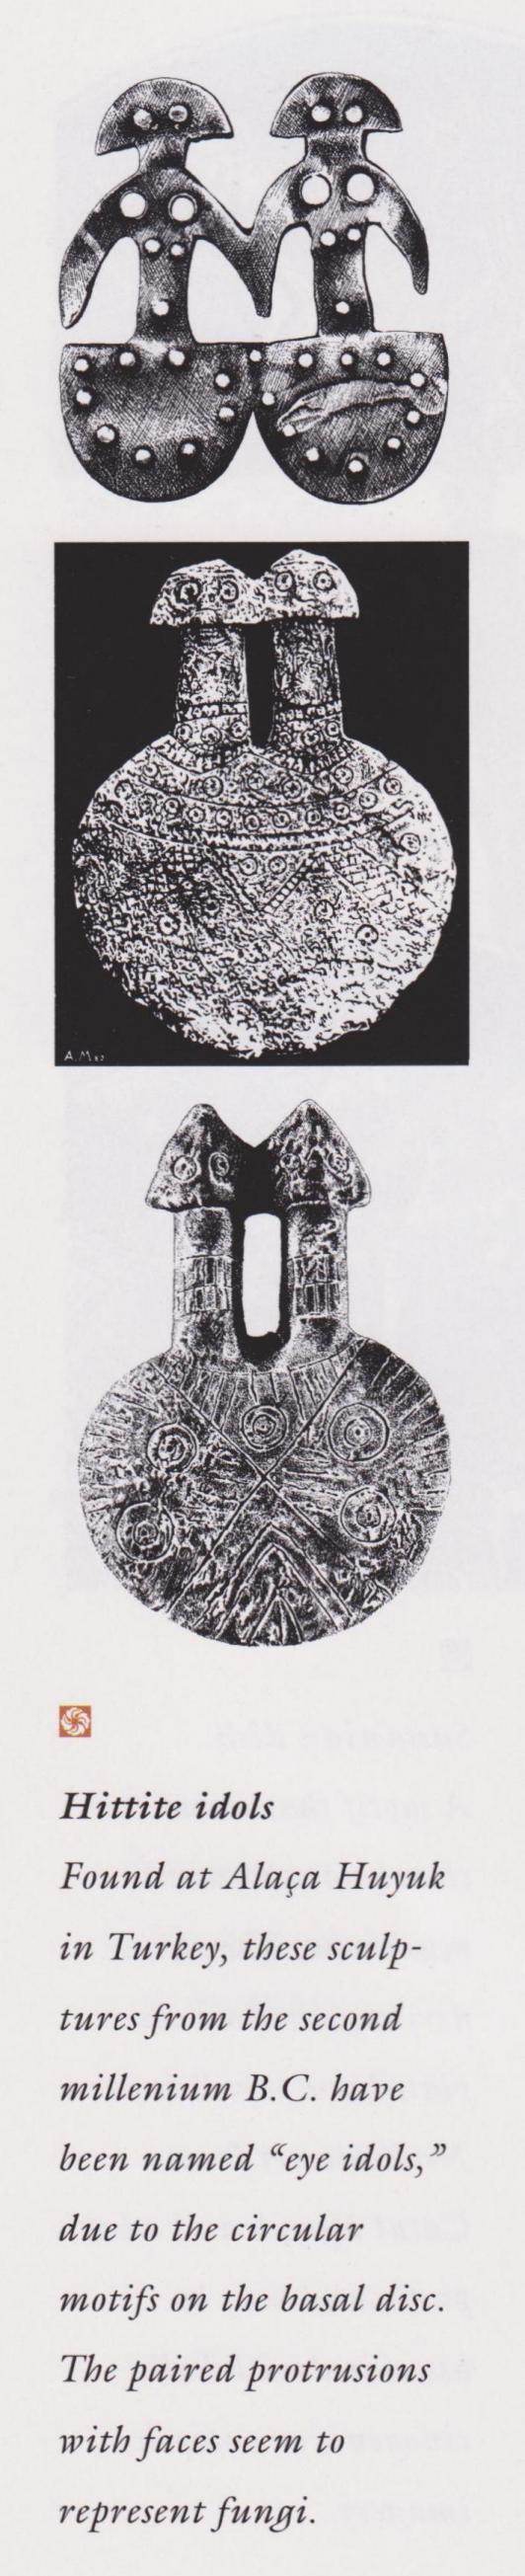 Hittite Idols